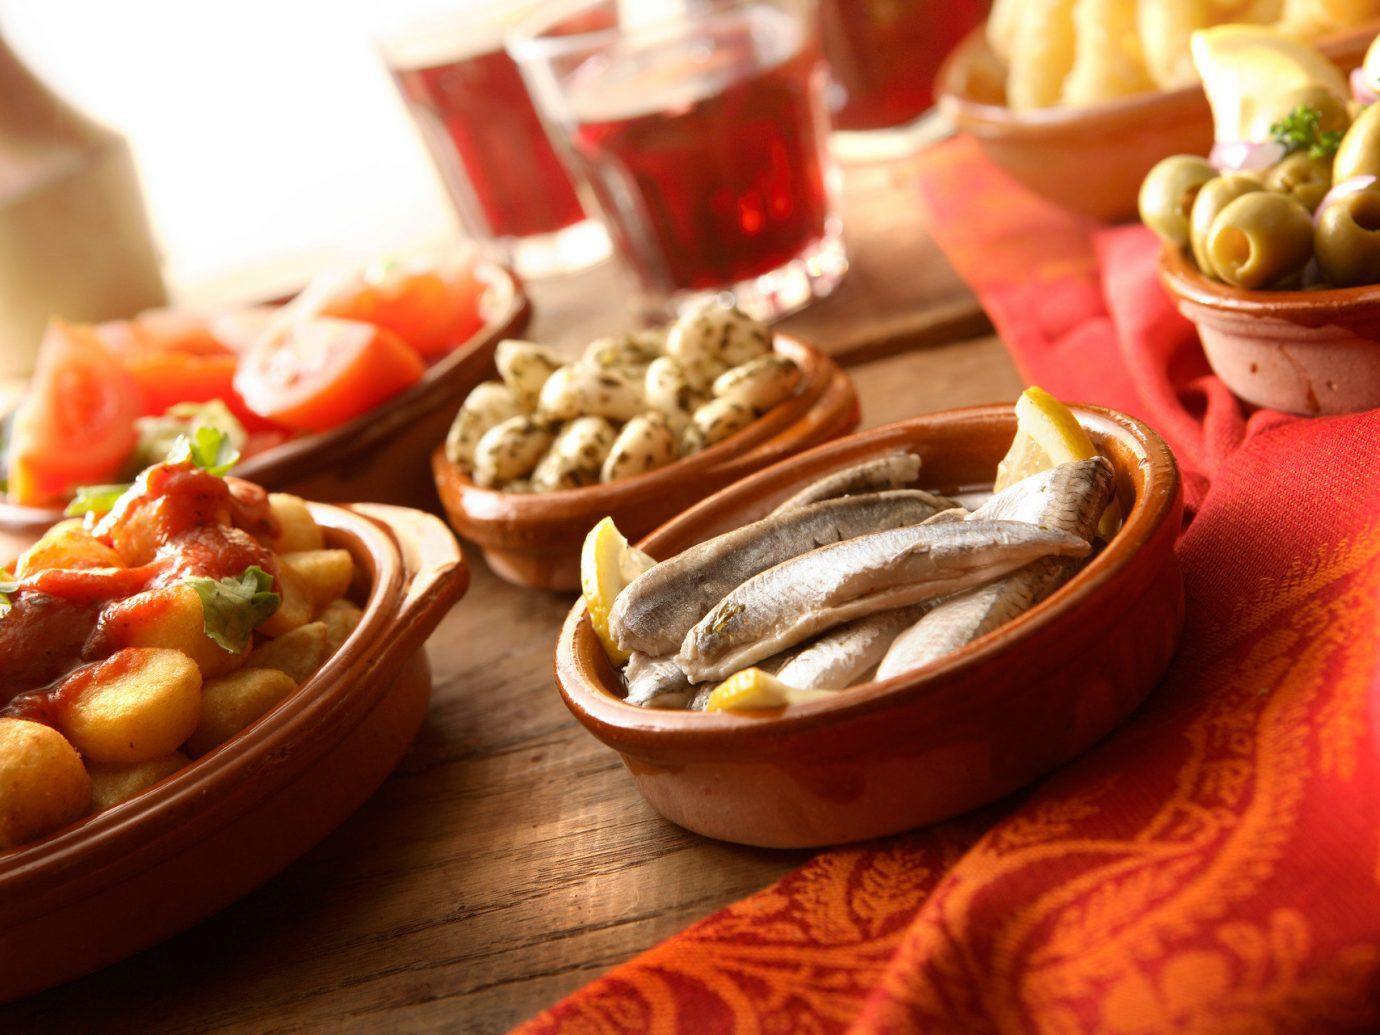 Trip Ideas food table dish indoor meal cuisine produce lunch breakfast vegetable